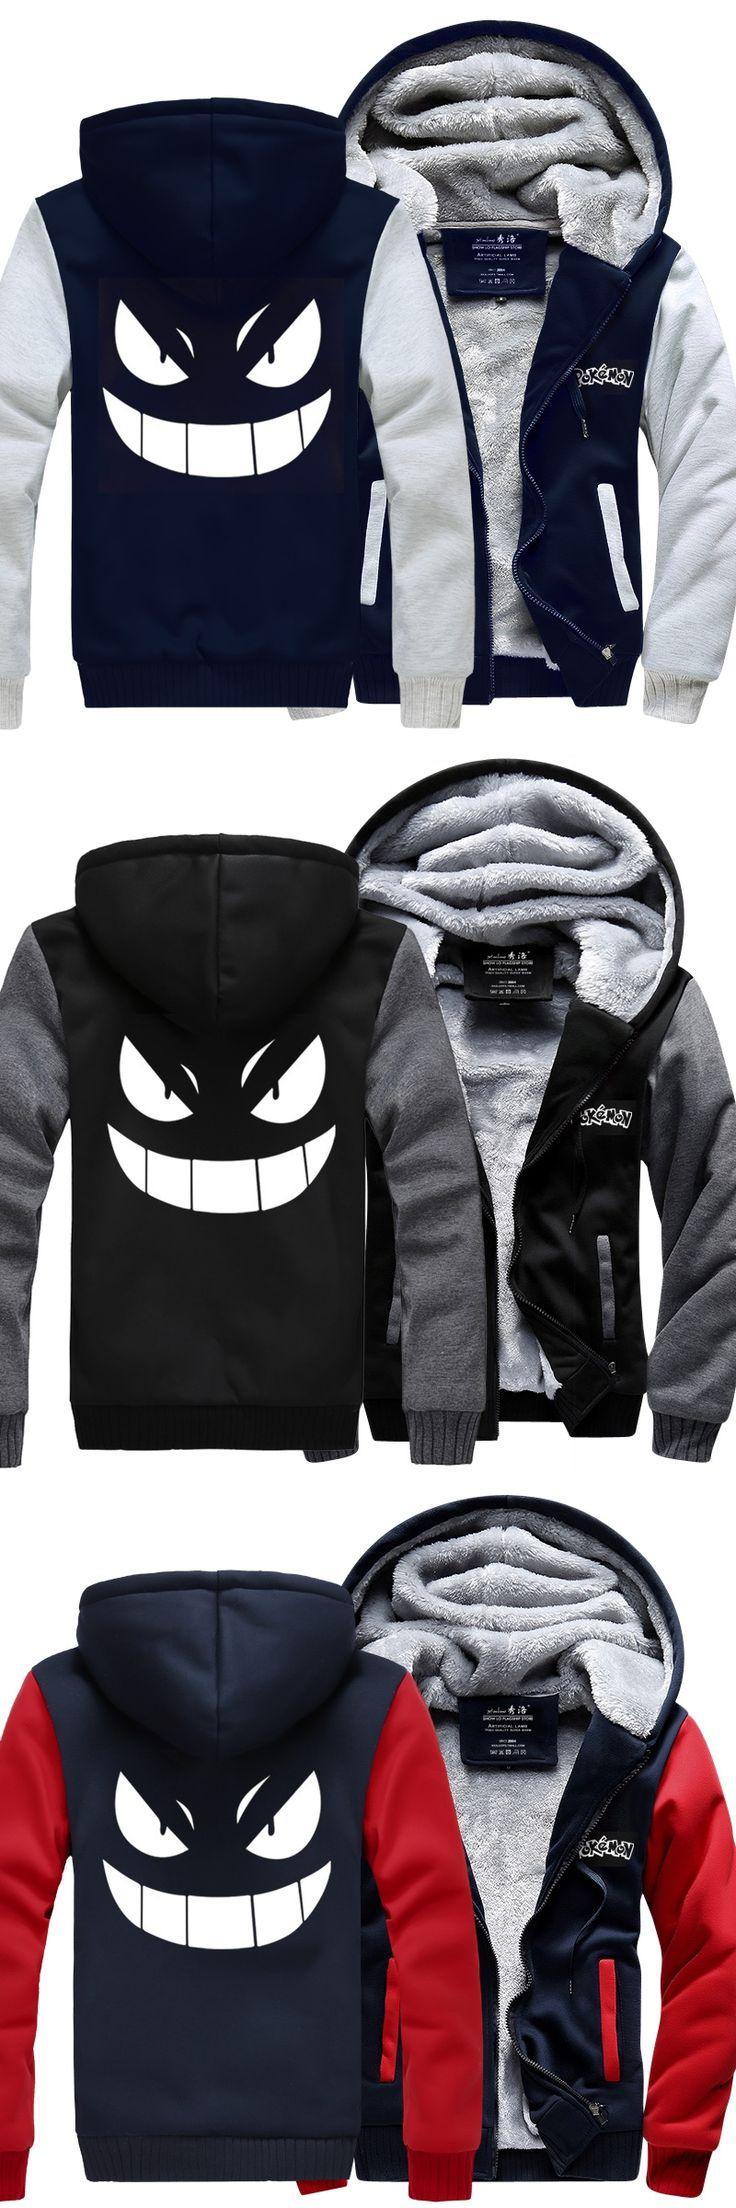 Pocket GO New Winter Jackets and Coats Pocket Monster hoodie Gengar Pokemon Hooded Thick Zipper Men cardigan Sweatshirts cosplay